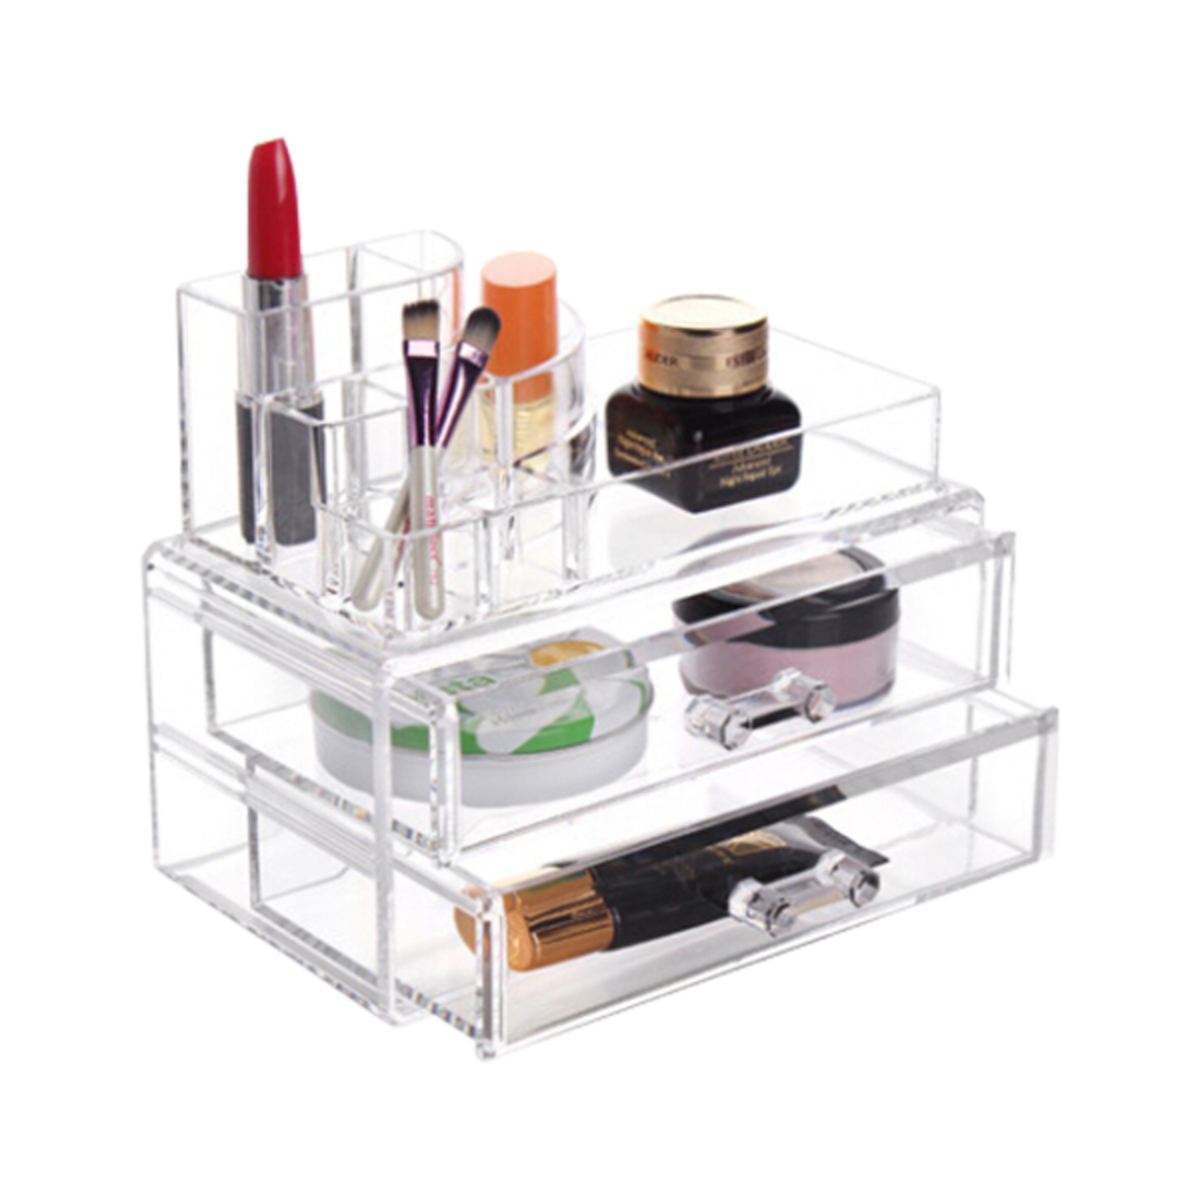 drawer unleashed velvet divider drawers storage crafts organizer image trays jewelry box of uk